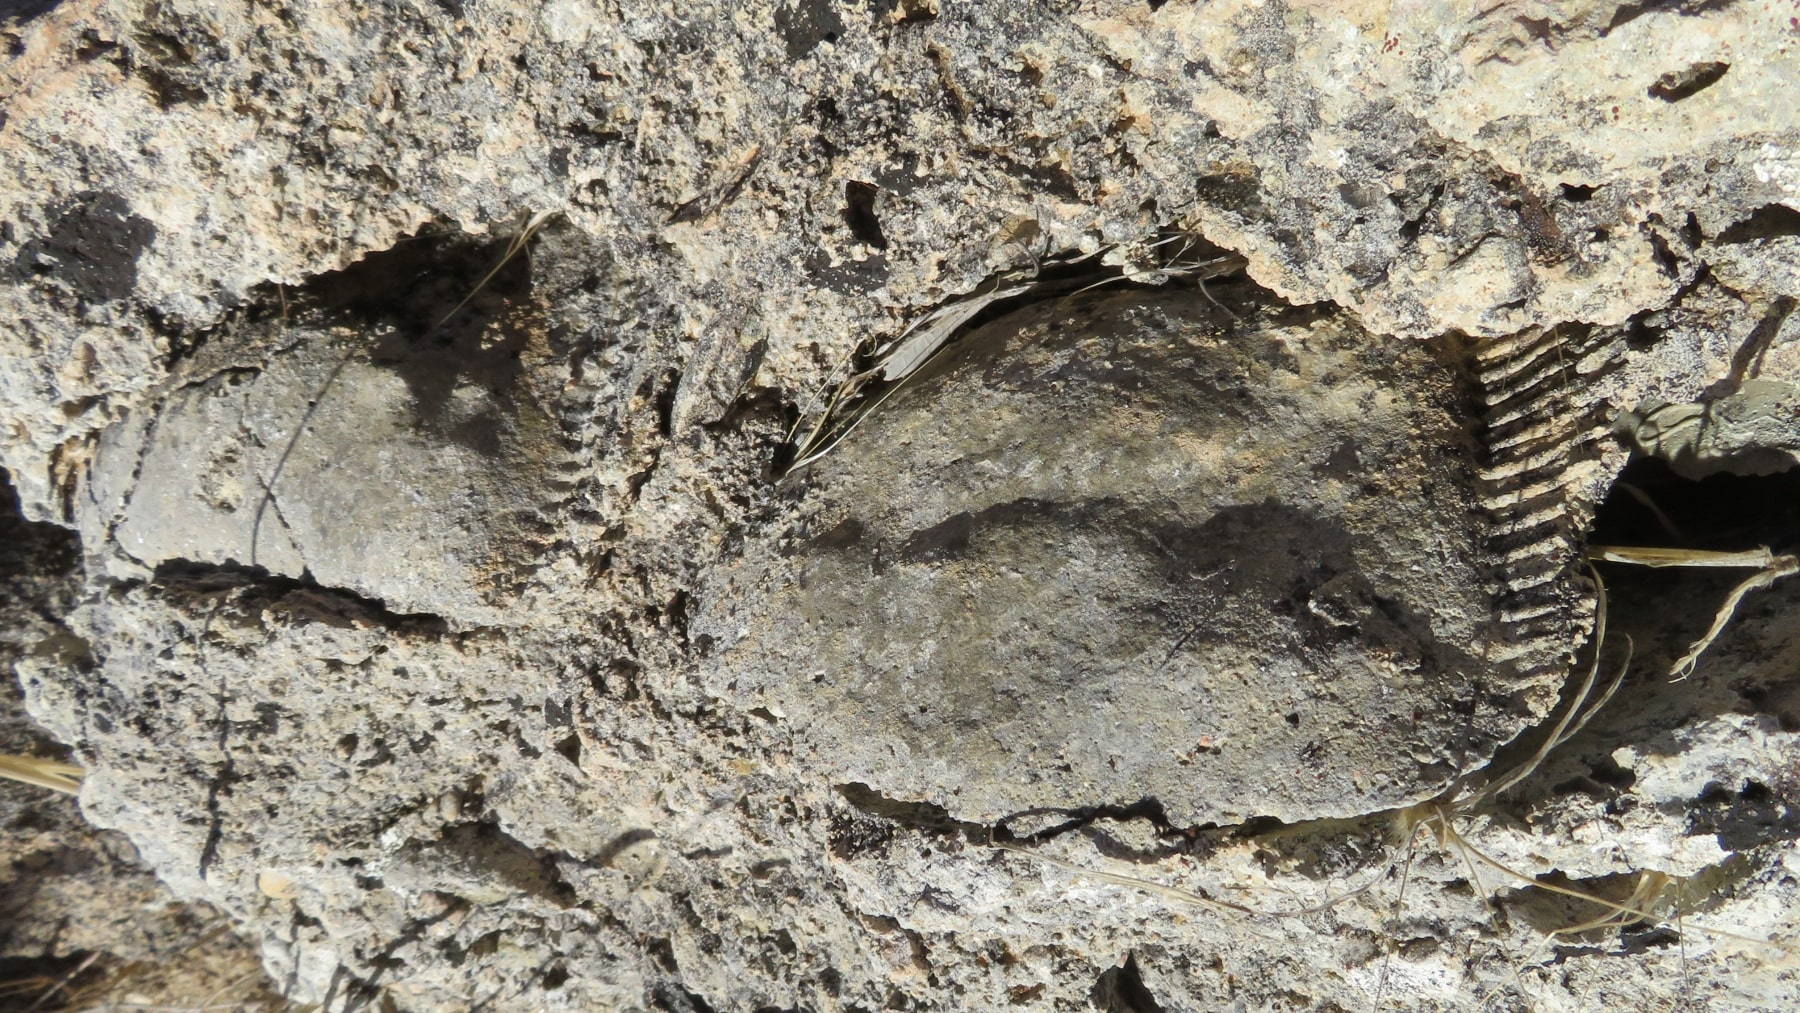 Fossils-5-min.jpg